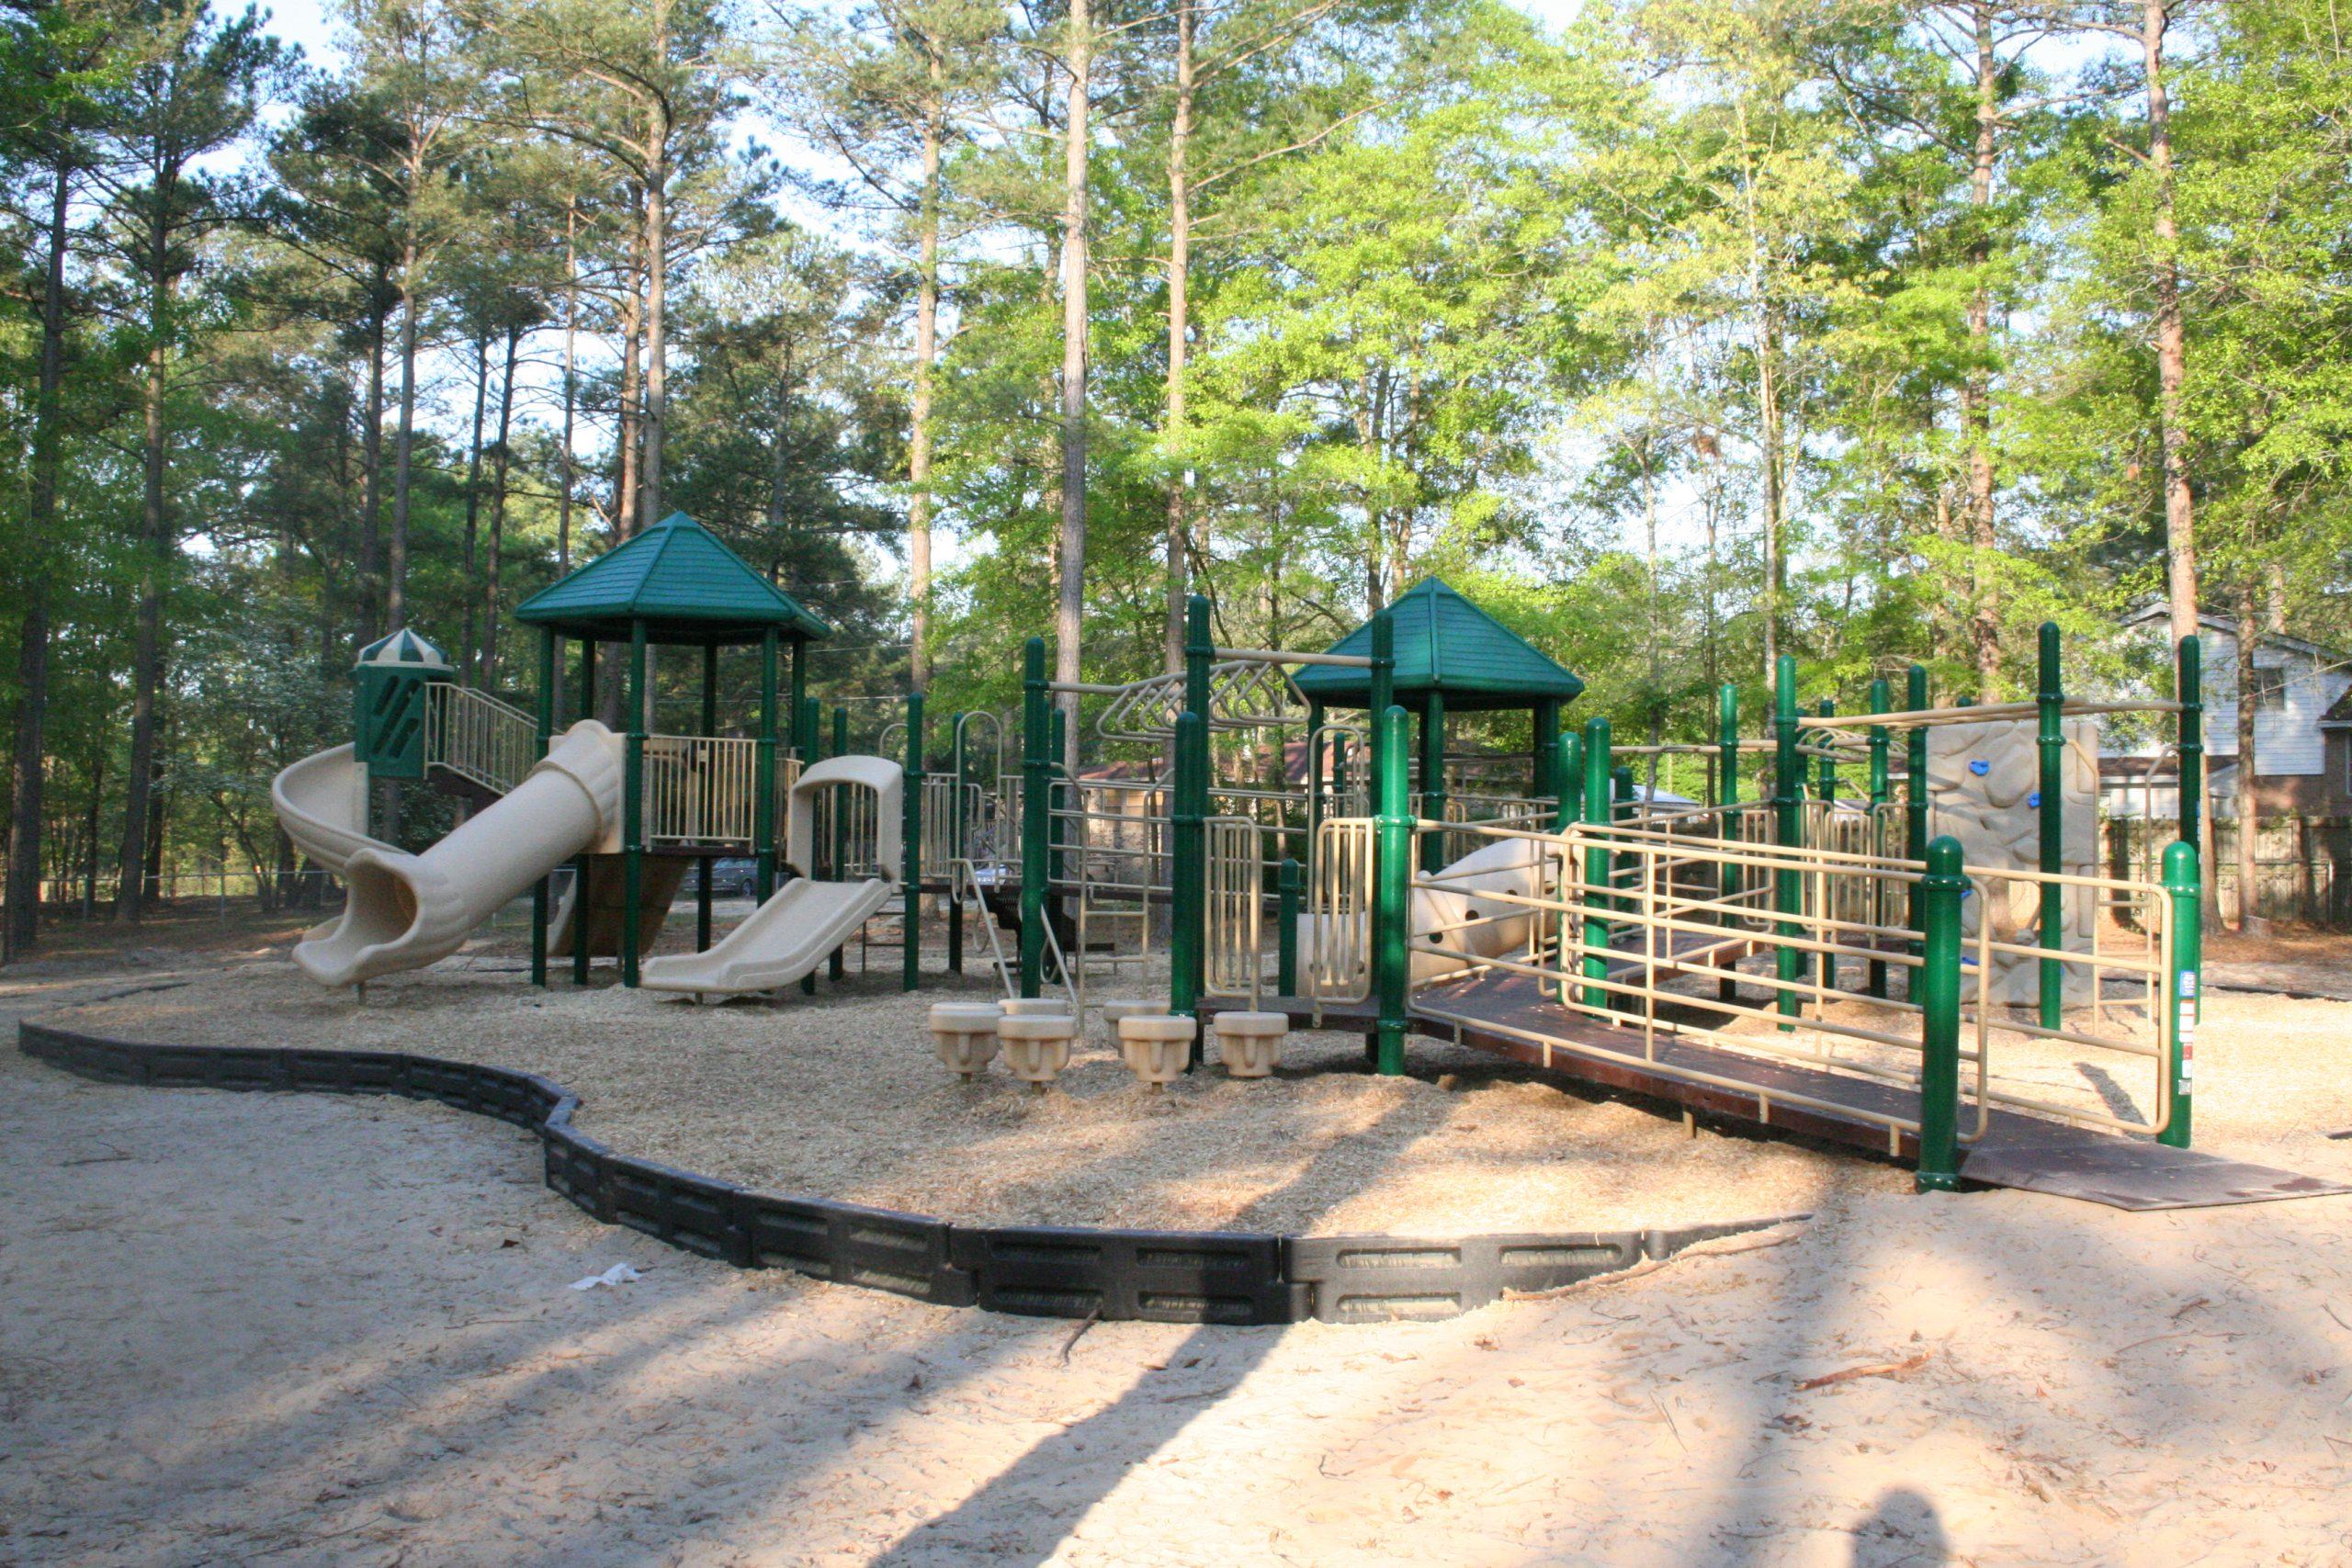 Summerhill Park